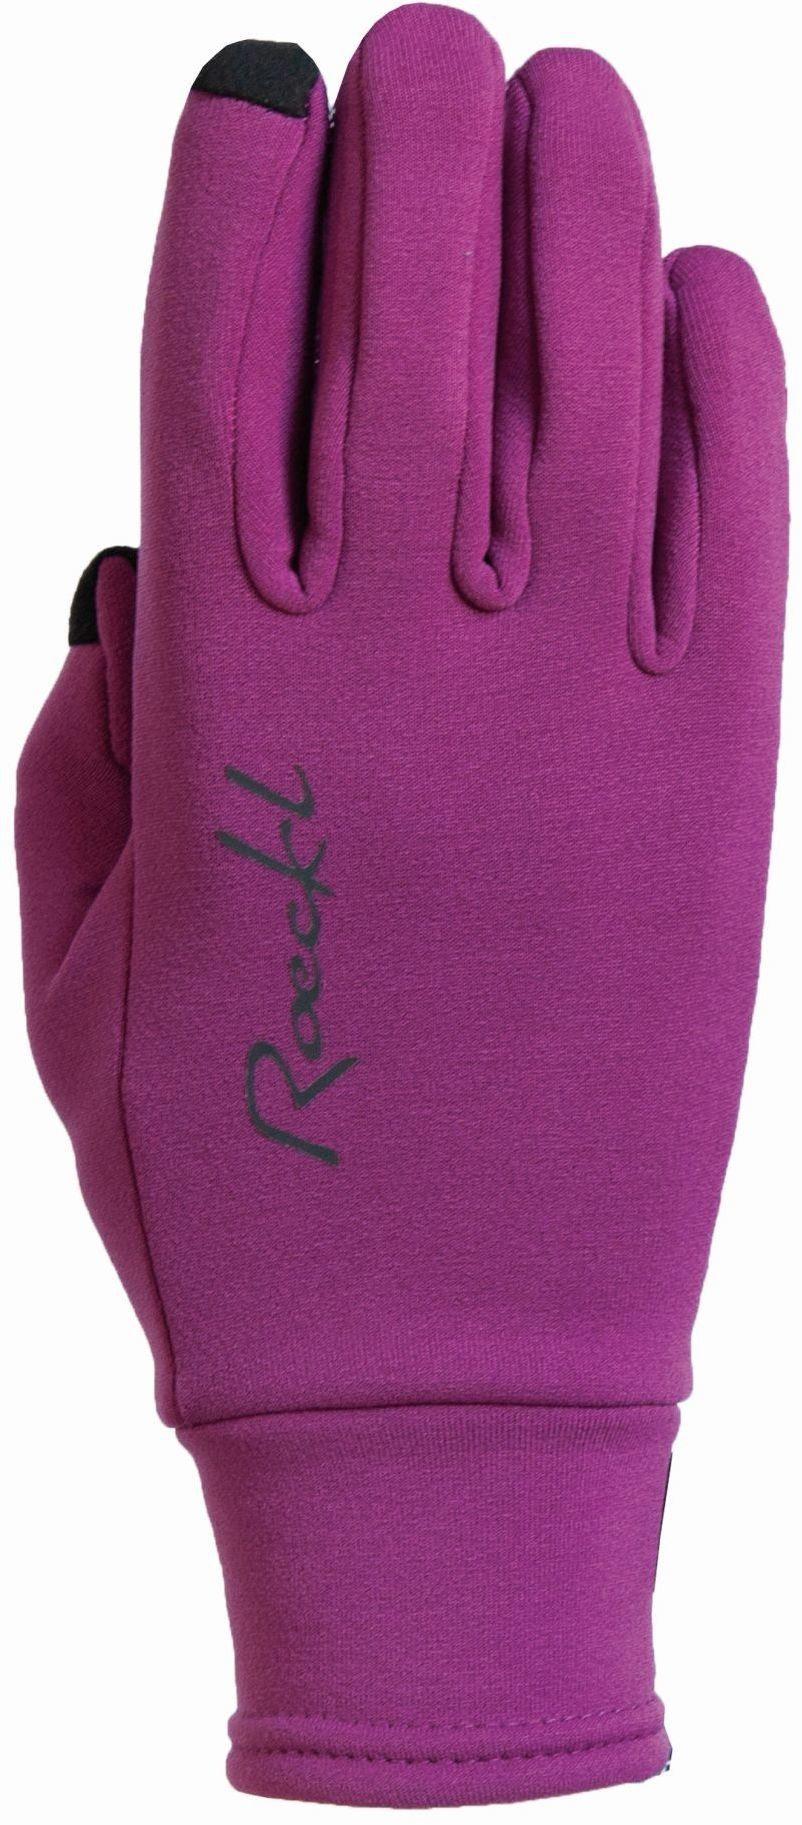 Unisex Roeckl Handschuhe »Paulista Handschuhe«    04044791655670